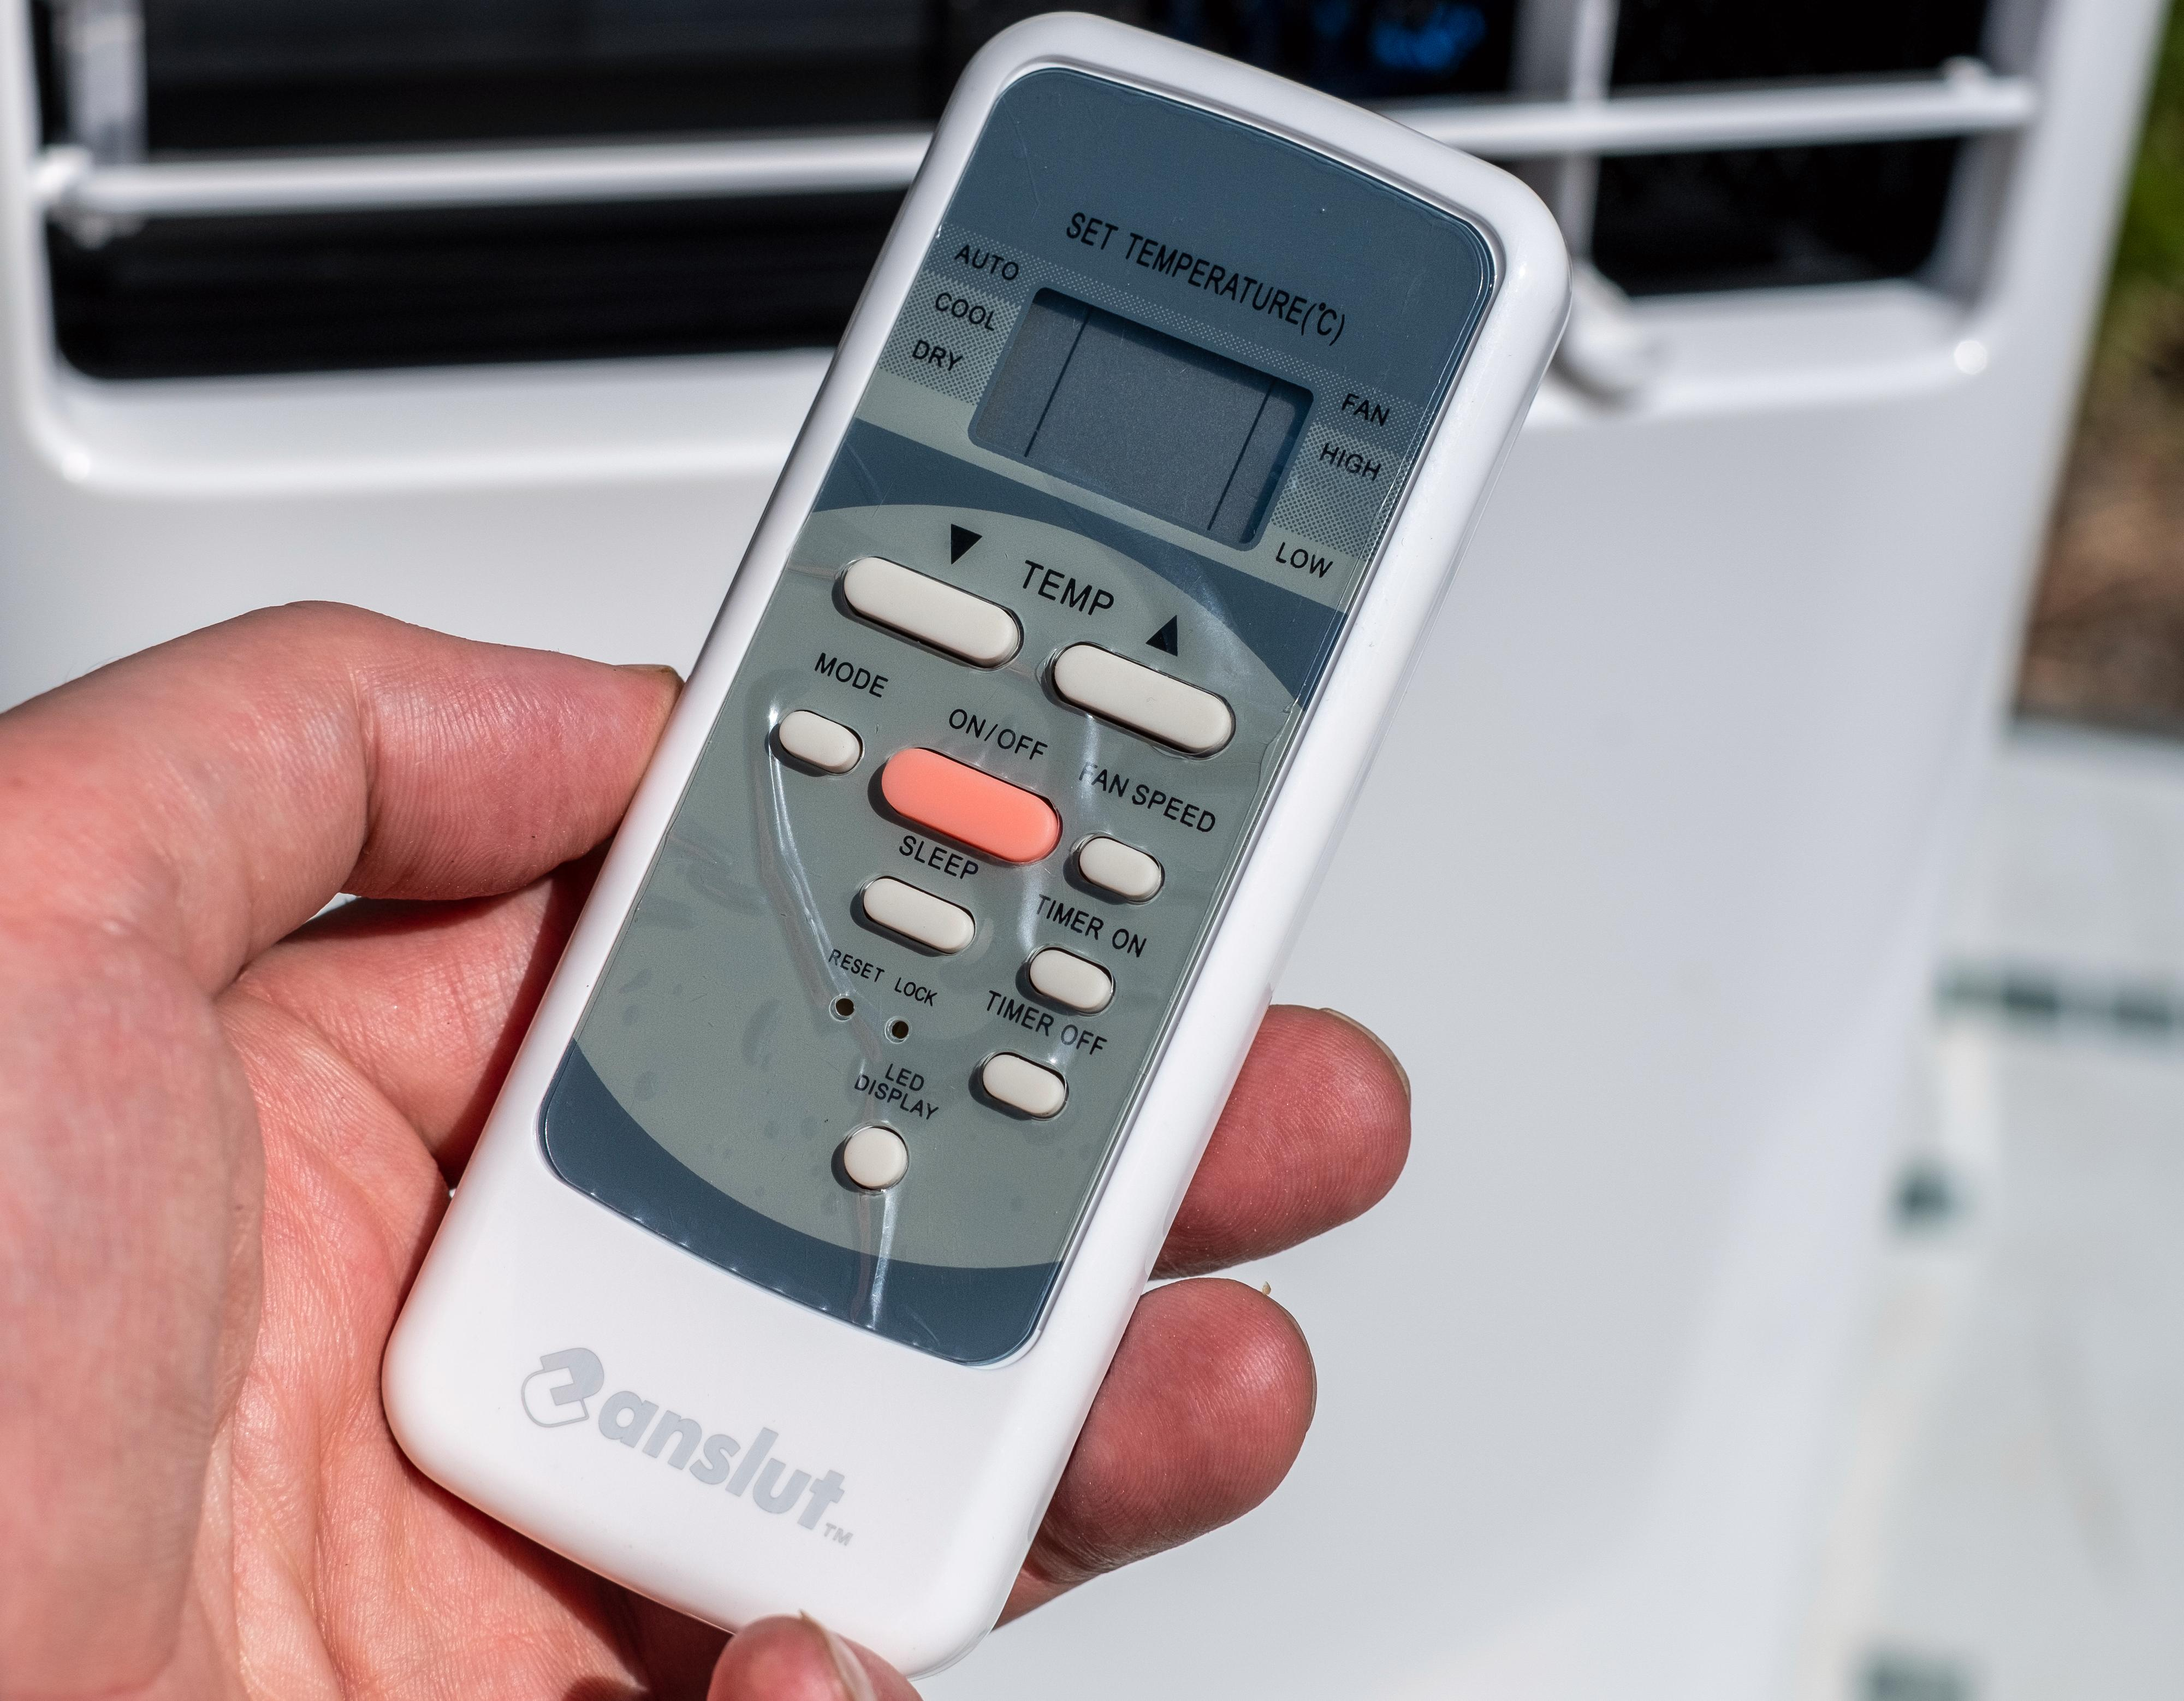 Fjernkontroll og vindusmontering antyder sterkt at Anslut-modellen kommer fra omtrent samme sted som Elkjøps Sandstrøm-maskin.